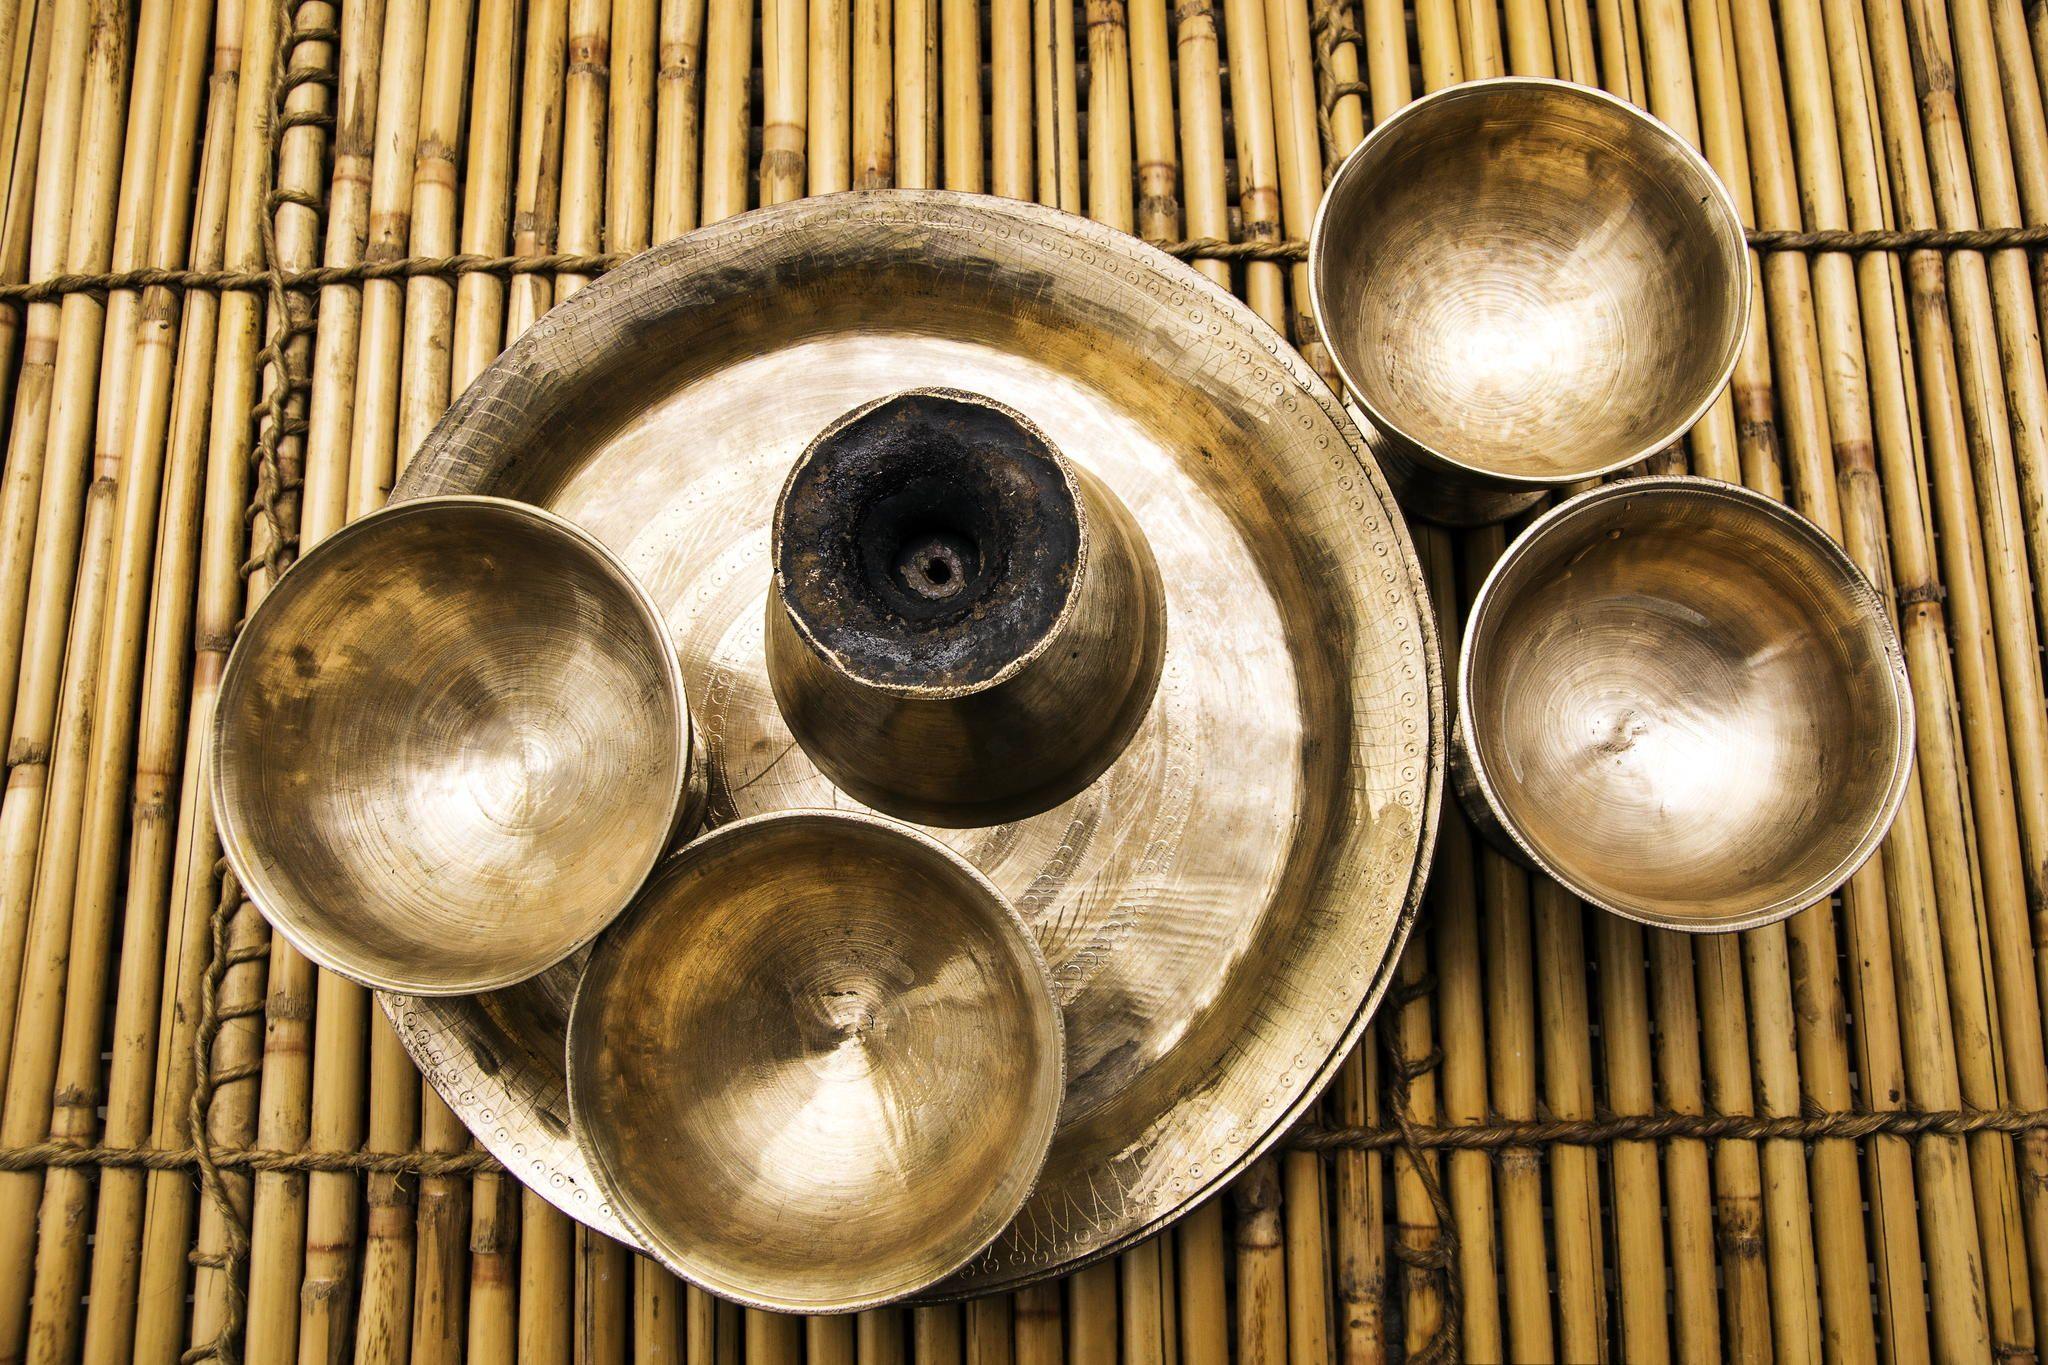 Bell Metal Utensils Of Assam With Images Brass Decor